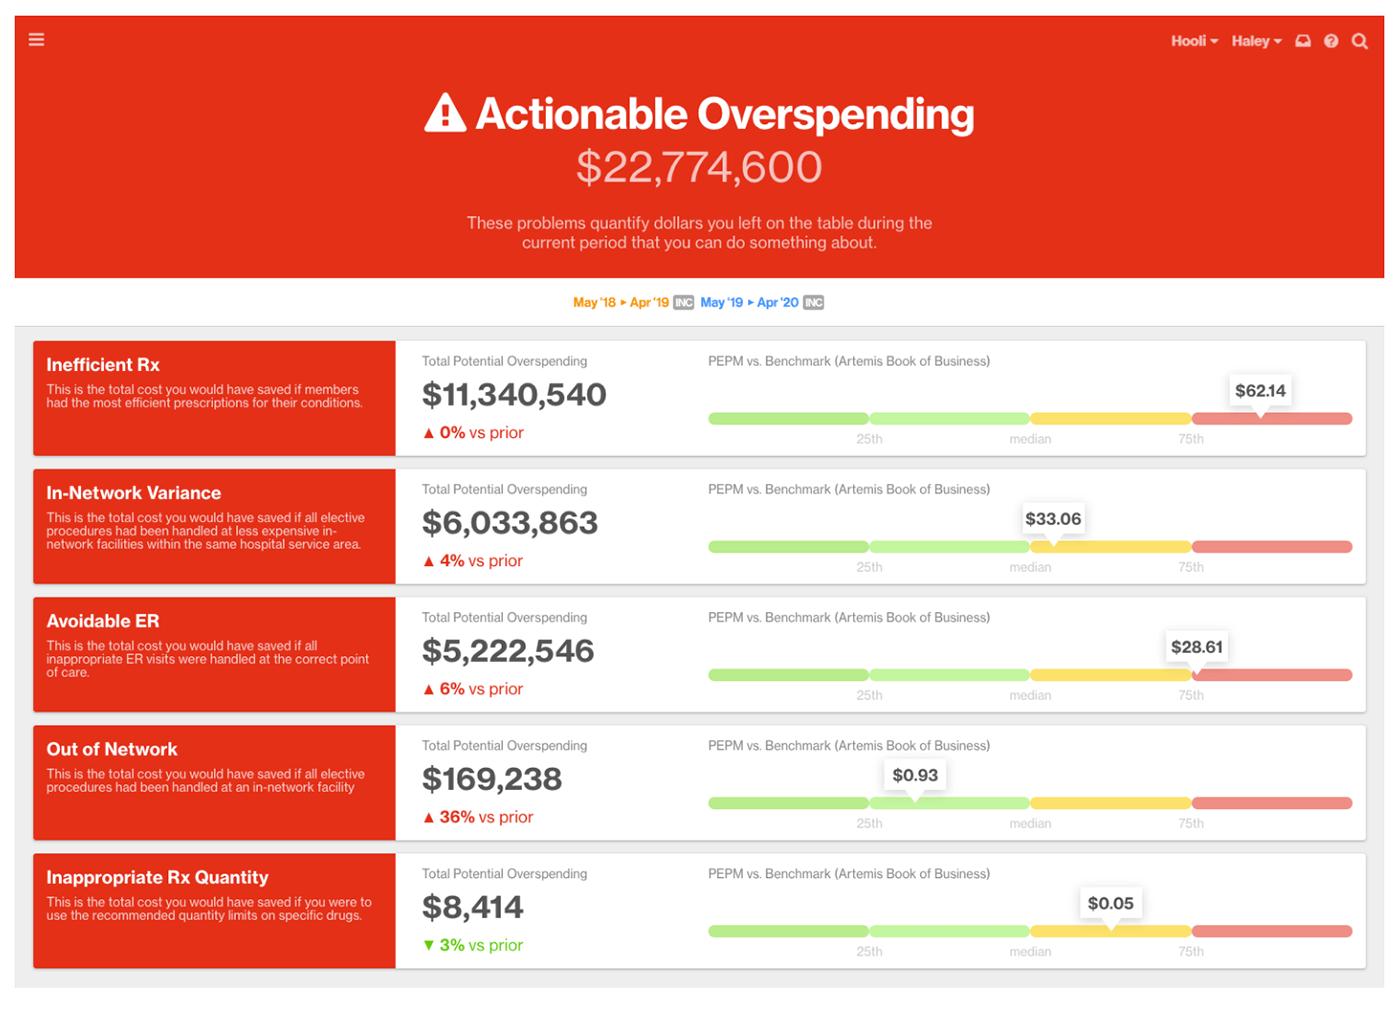 Chart showing actionable overspending on employee benefits costs in five categories